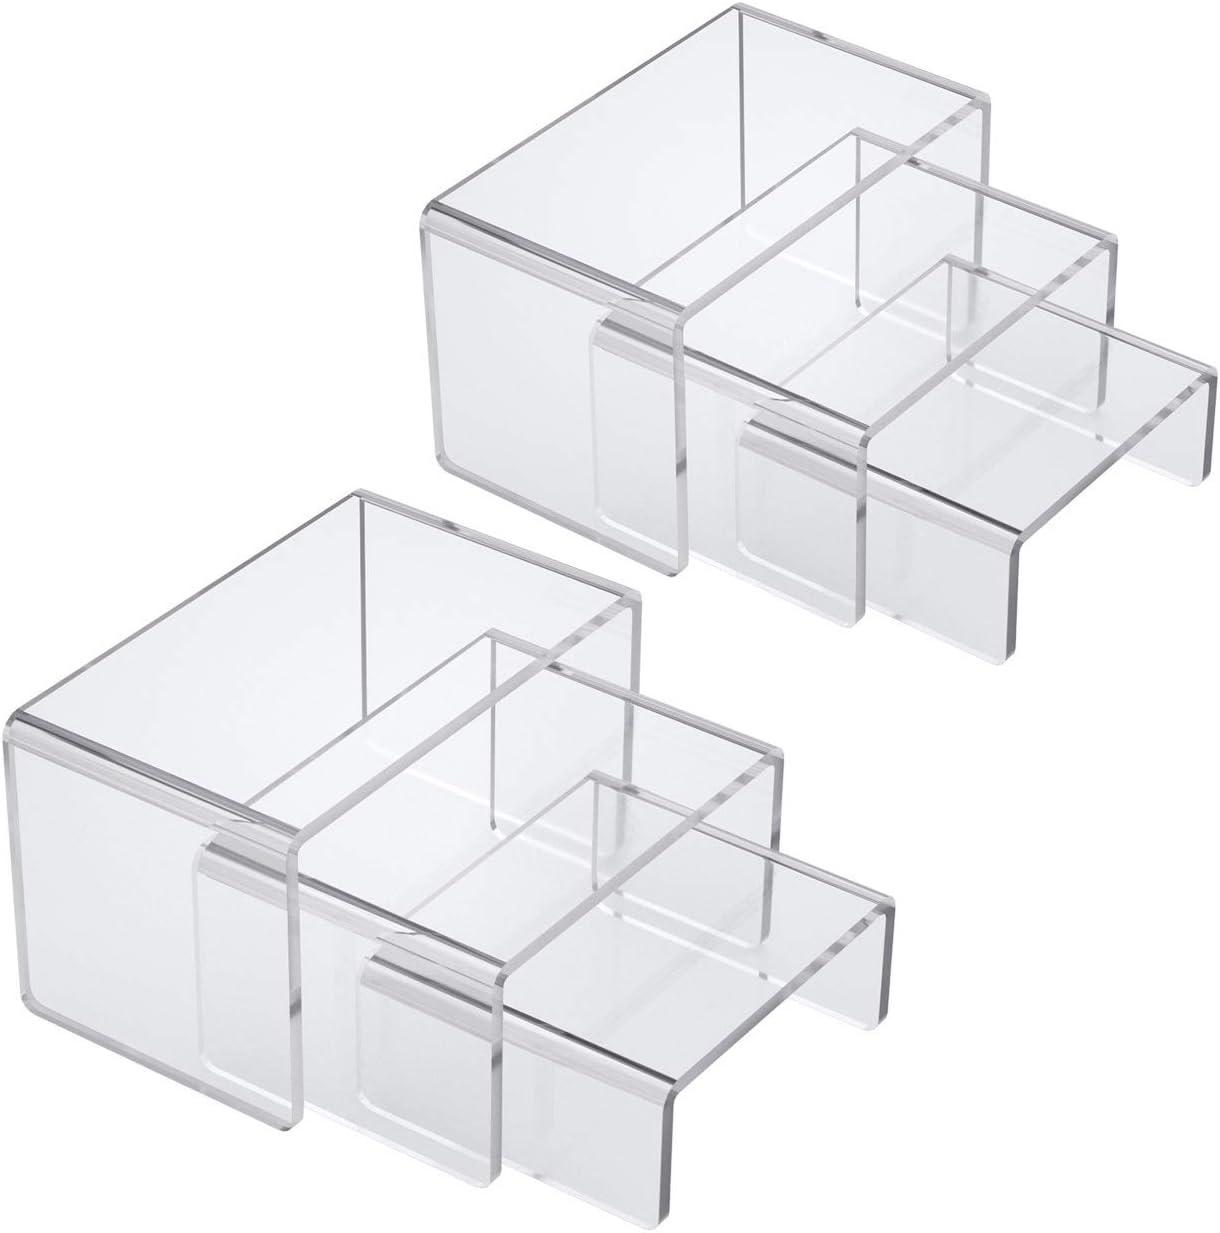 "NIUBEE Acrylic Display Risers Stand 2 Sets,3 Steps Clear Riser Shelf Showcase for Amiibo Funko POP Figures -3""x3""x4"""